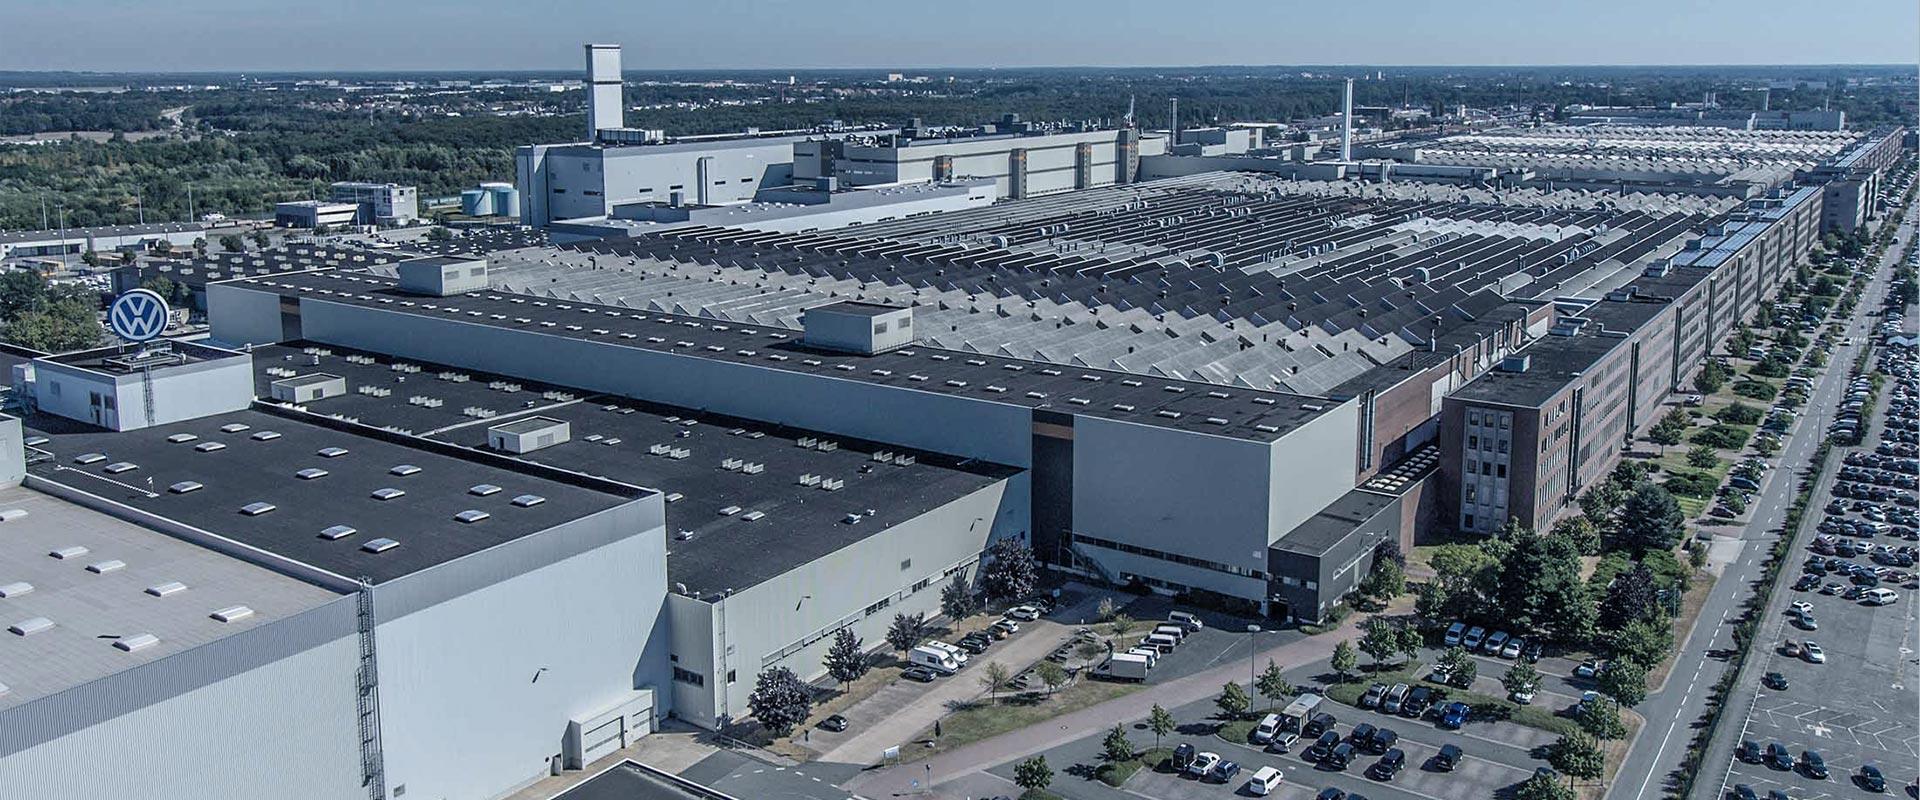 Online IAT Referenz VW Volkswagen Nutzfahrzeuge